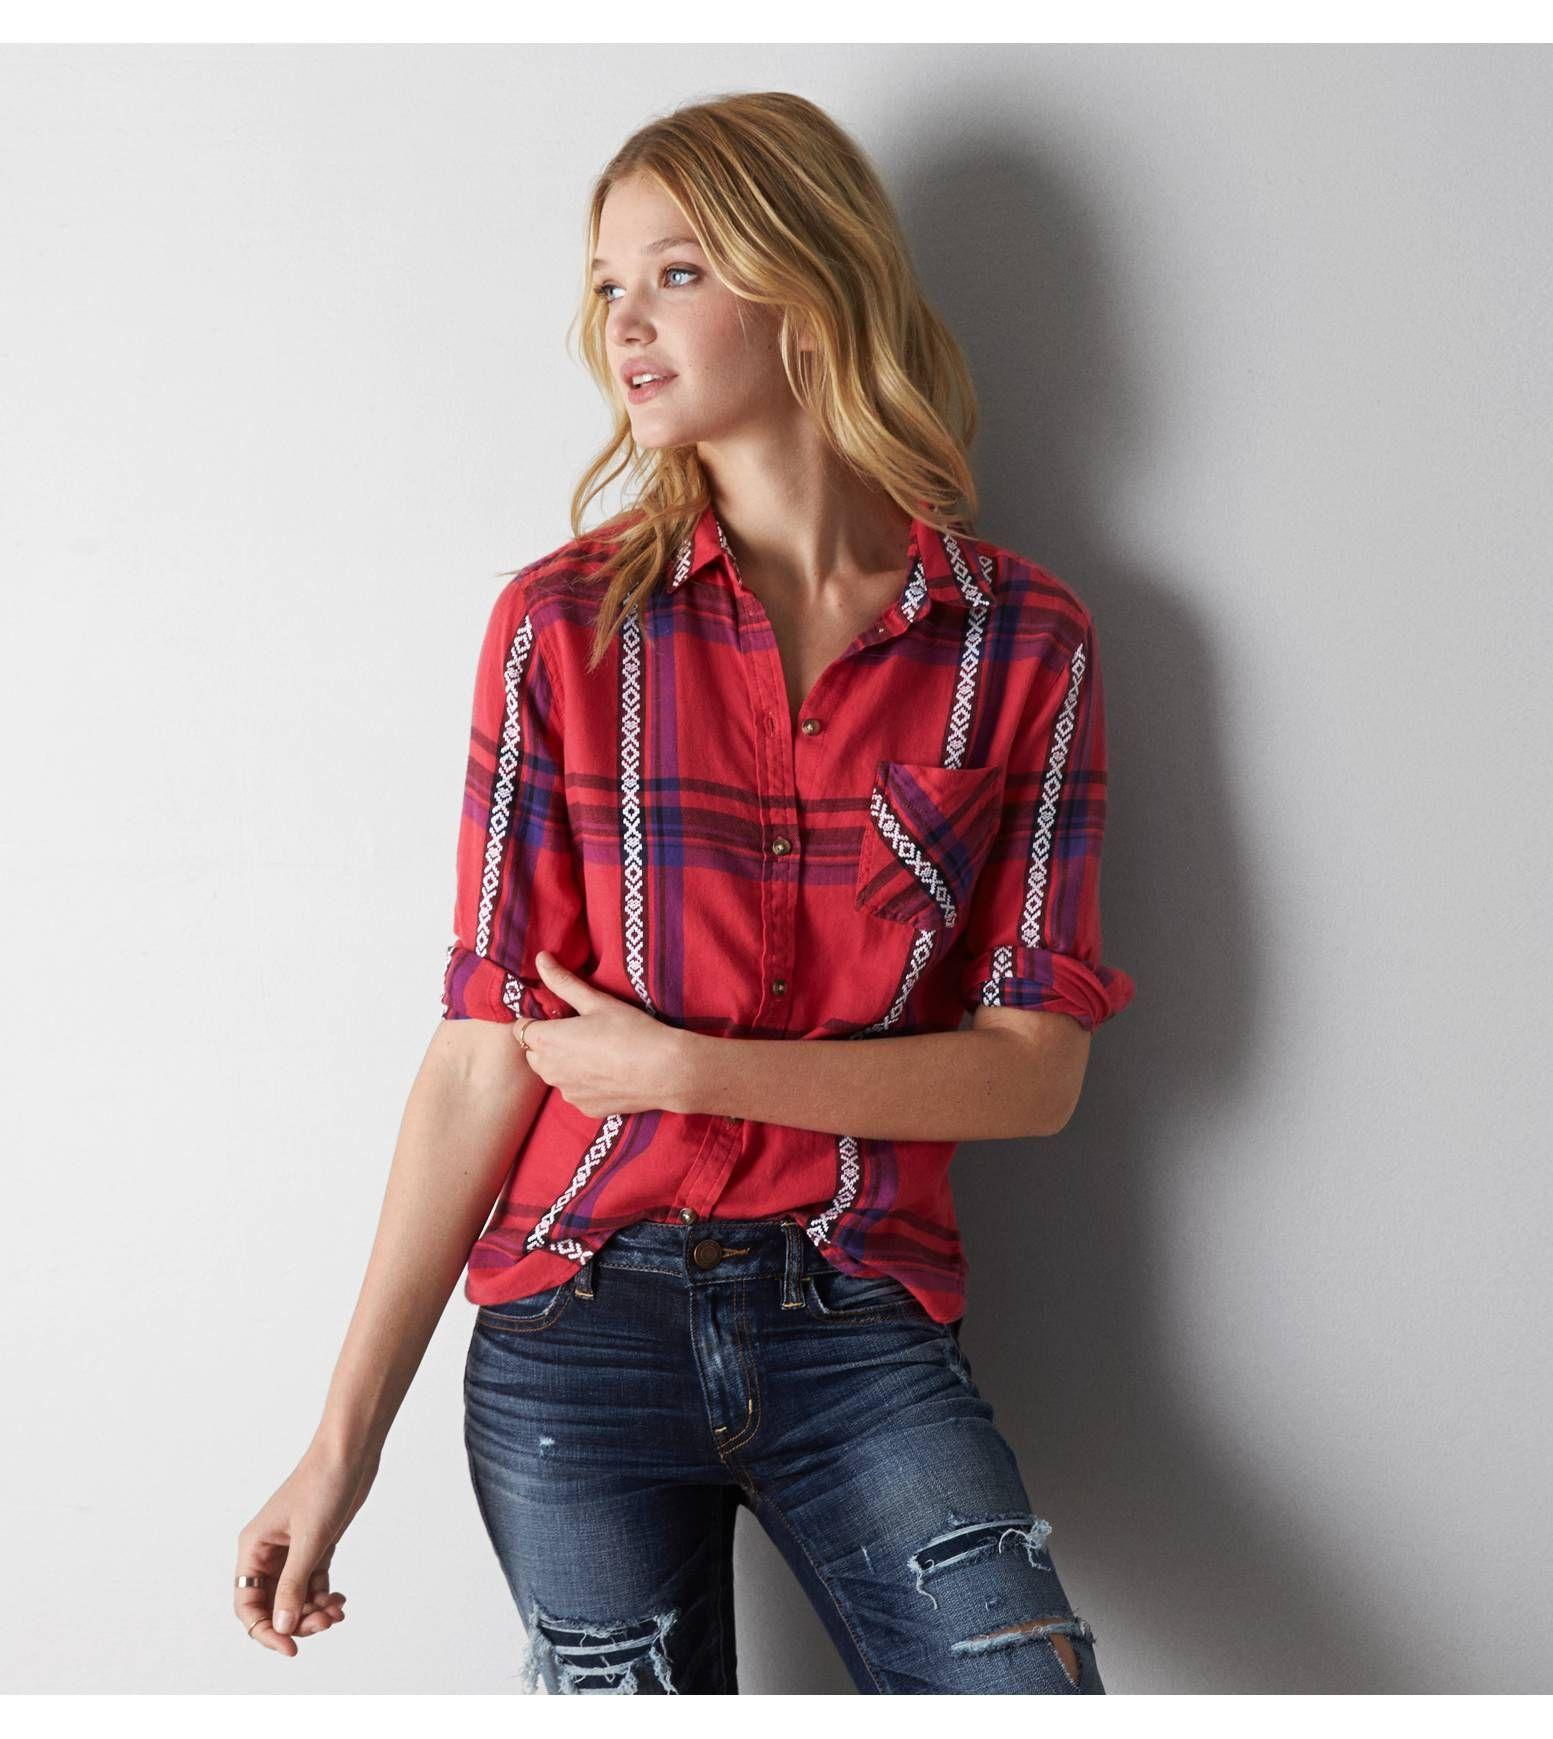 Red flannel around waist  Red AEO Jaquard Plaid Shirt  xxFashionxx  Pinterest  Aeo Plaid